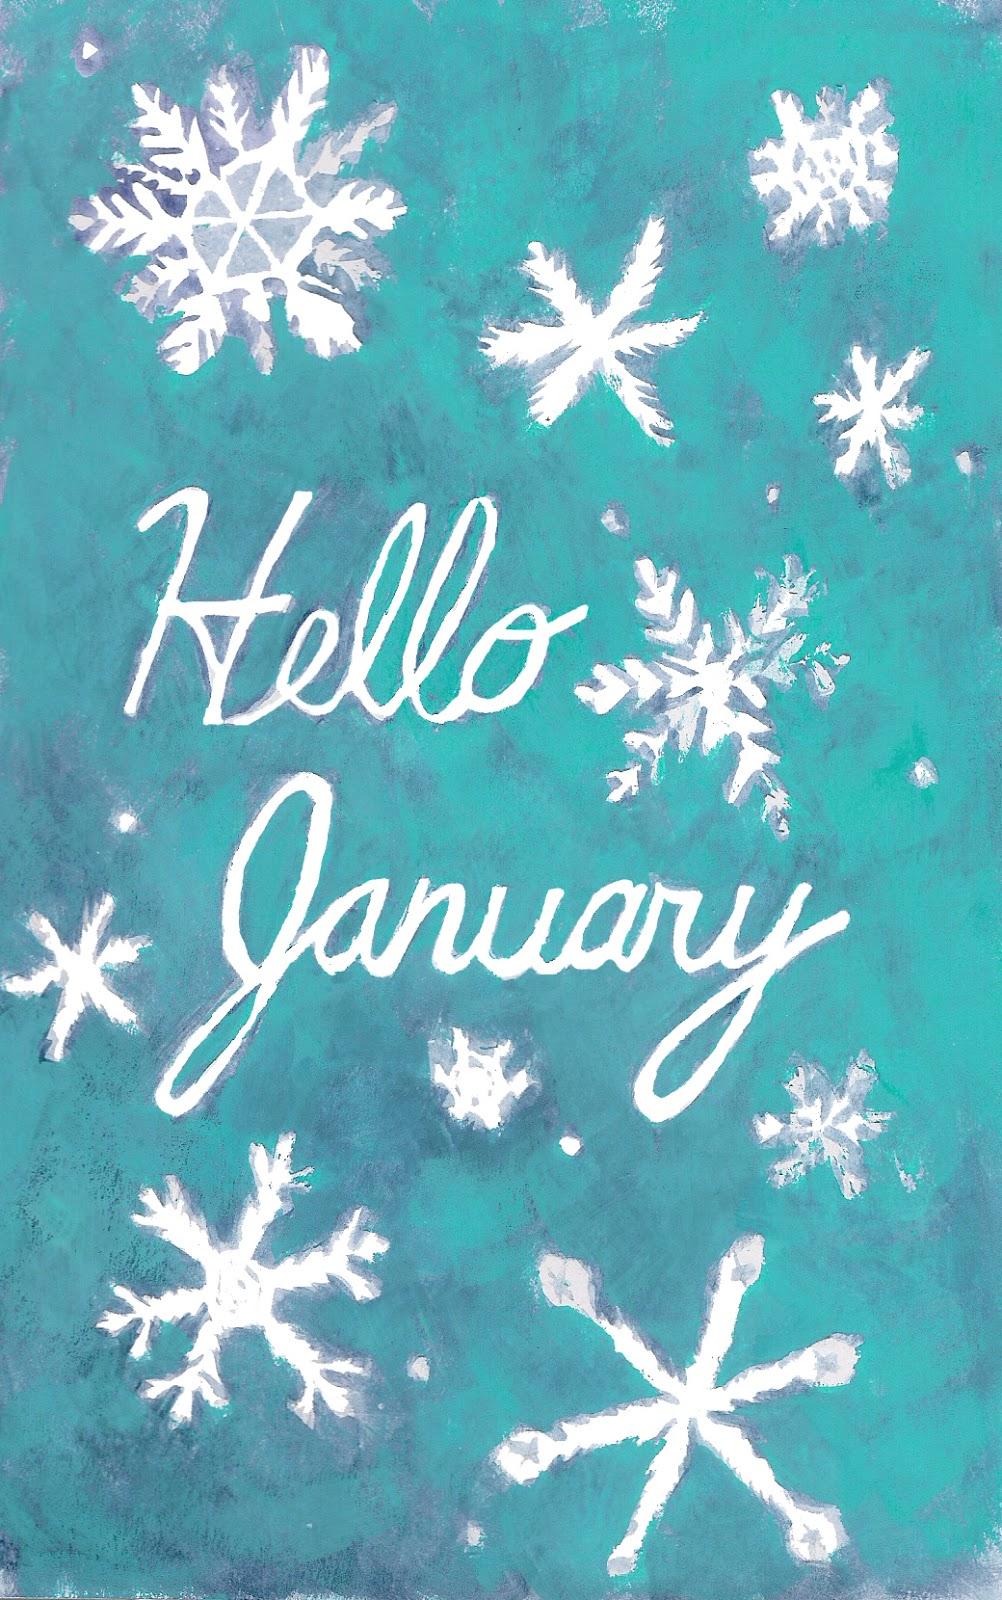 January Wallpaper Iphone - 1002x1600 - Download HD Wallpaper - WallpaperTip